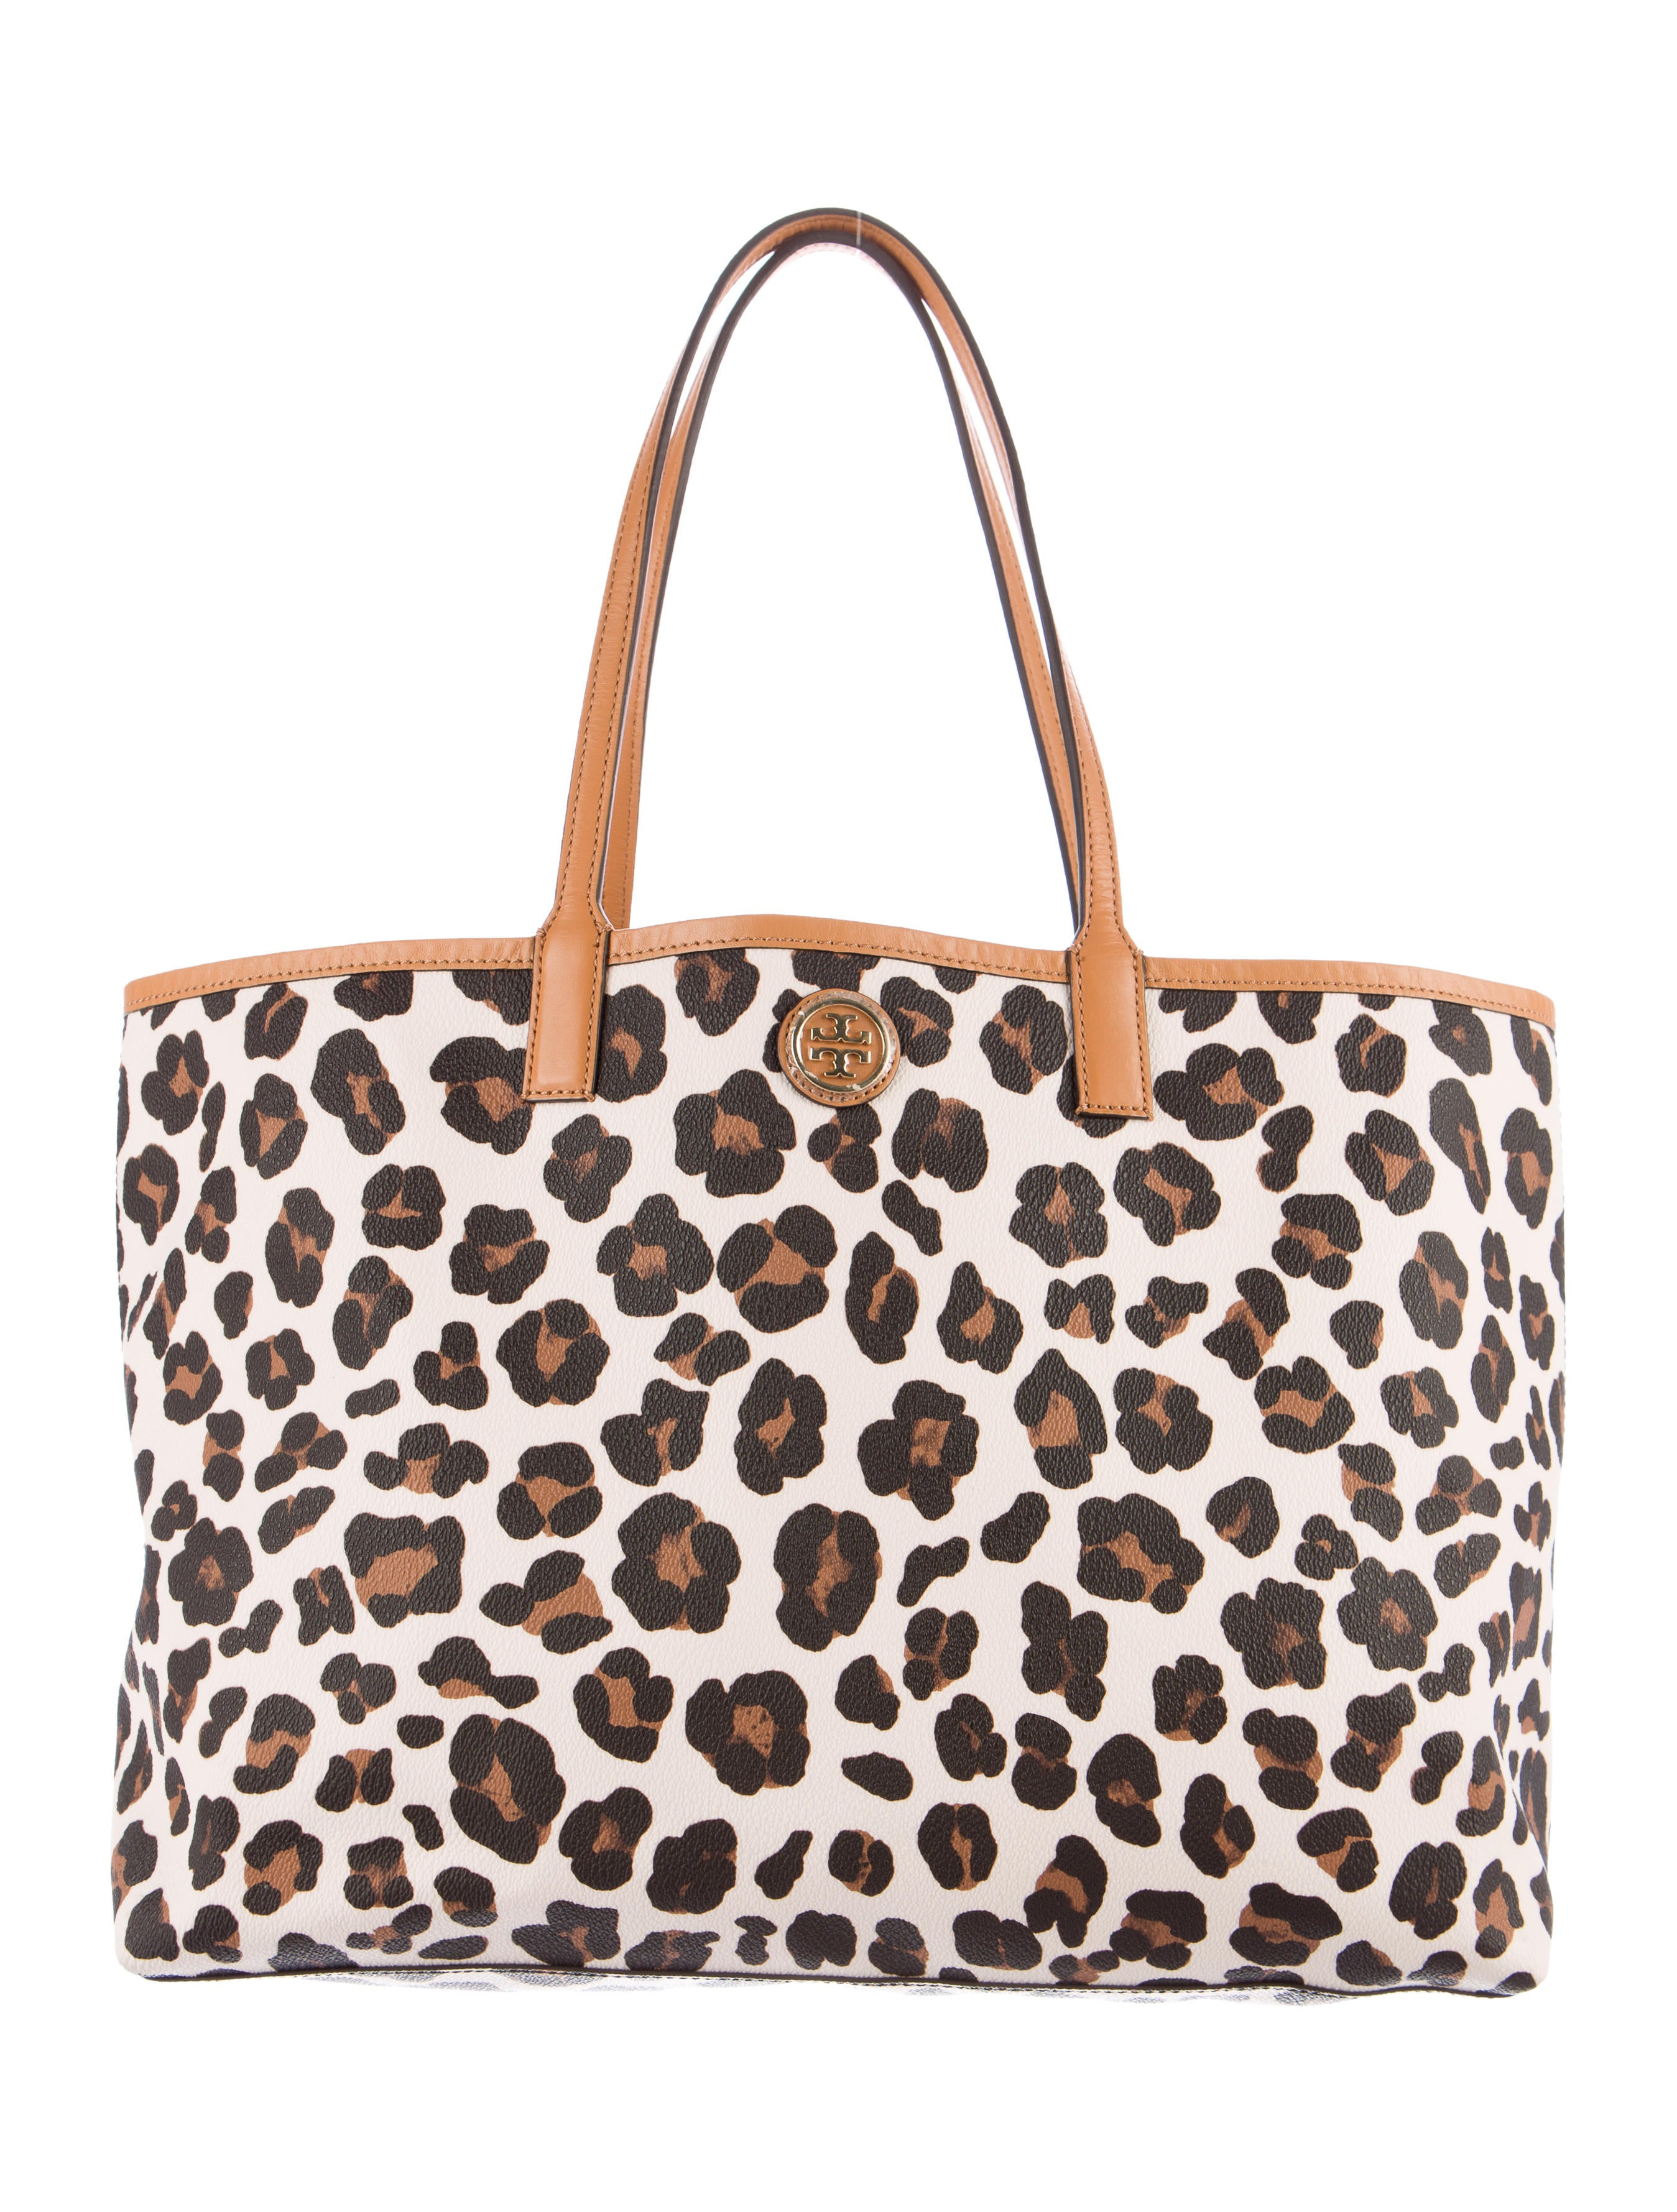 8aedf6fd63ef Tory Burch Kerrington Leopard Print Tote - Handbags - WTO90211   The ...